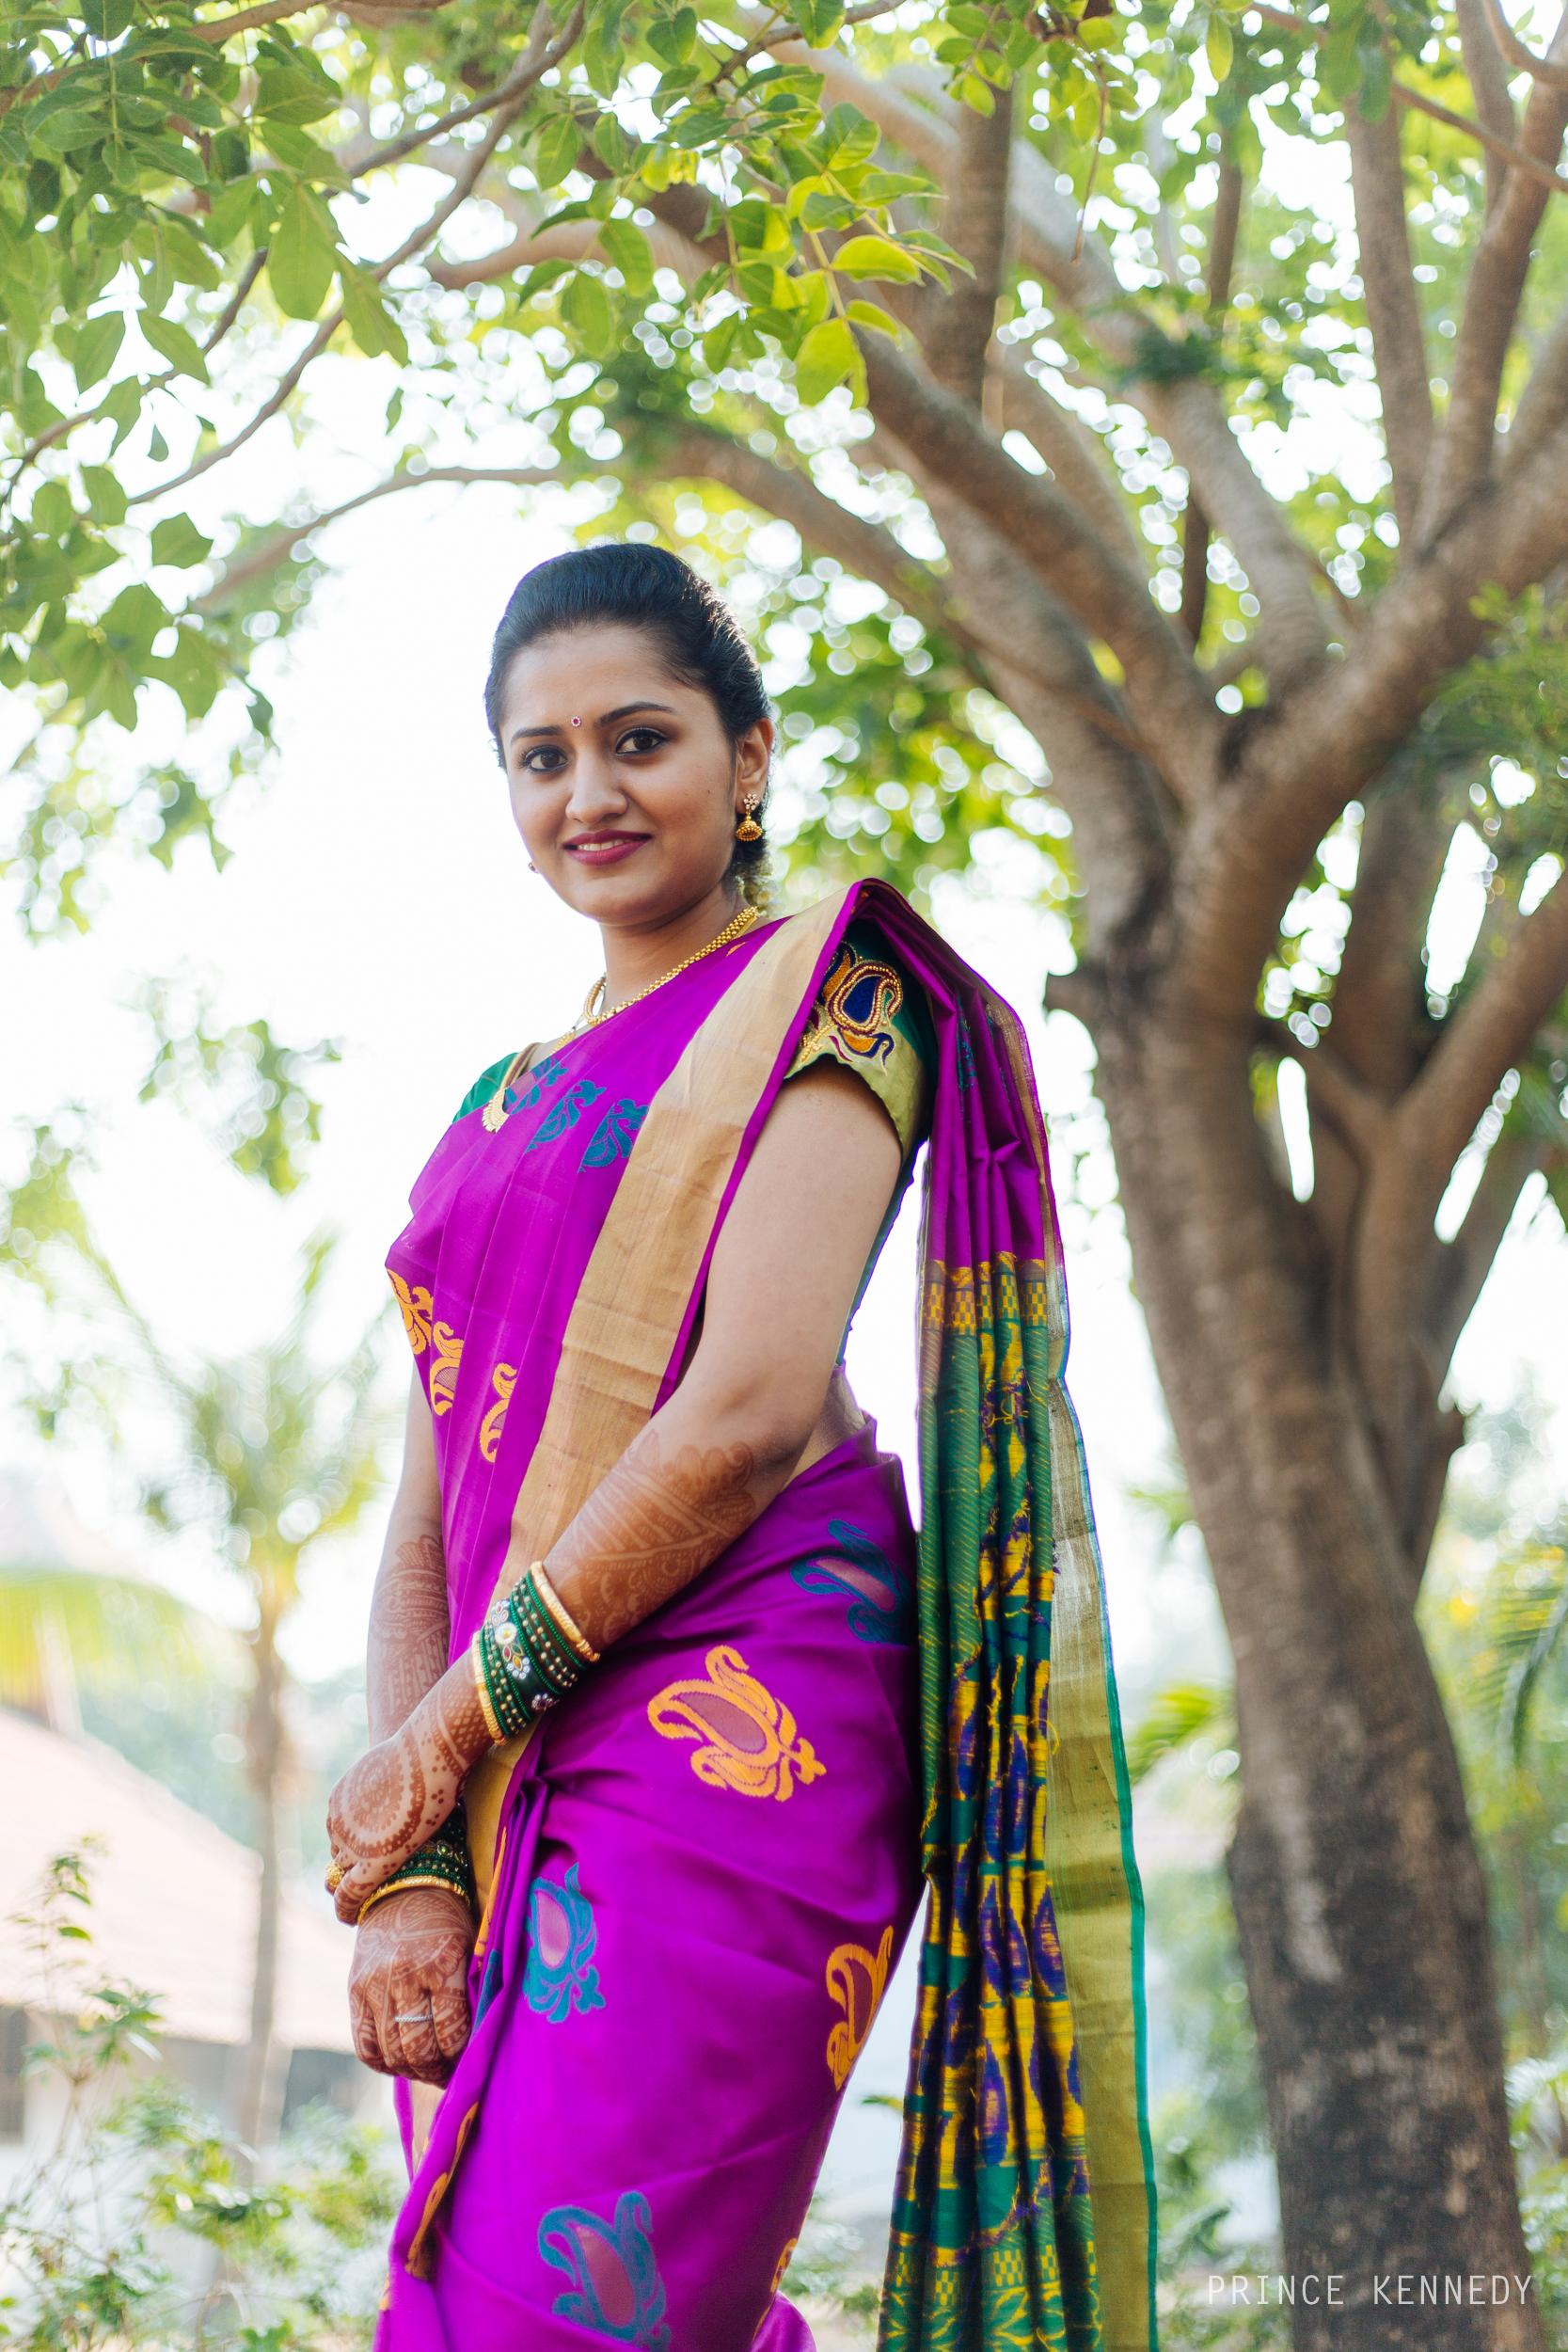 Athmajja-Nithesh-Engagement-Couple-Portrait-Portraiture-Wedding-Couple-Portrait-Chennai-Photographer-Candid-Photography-Destination-Best-Prince-Kennedy-Photography-16.jpg